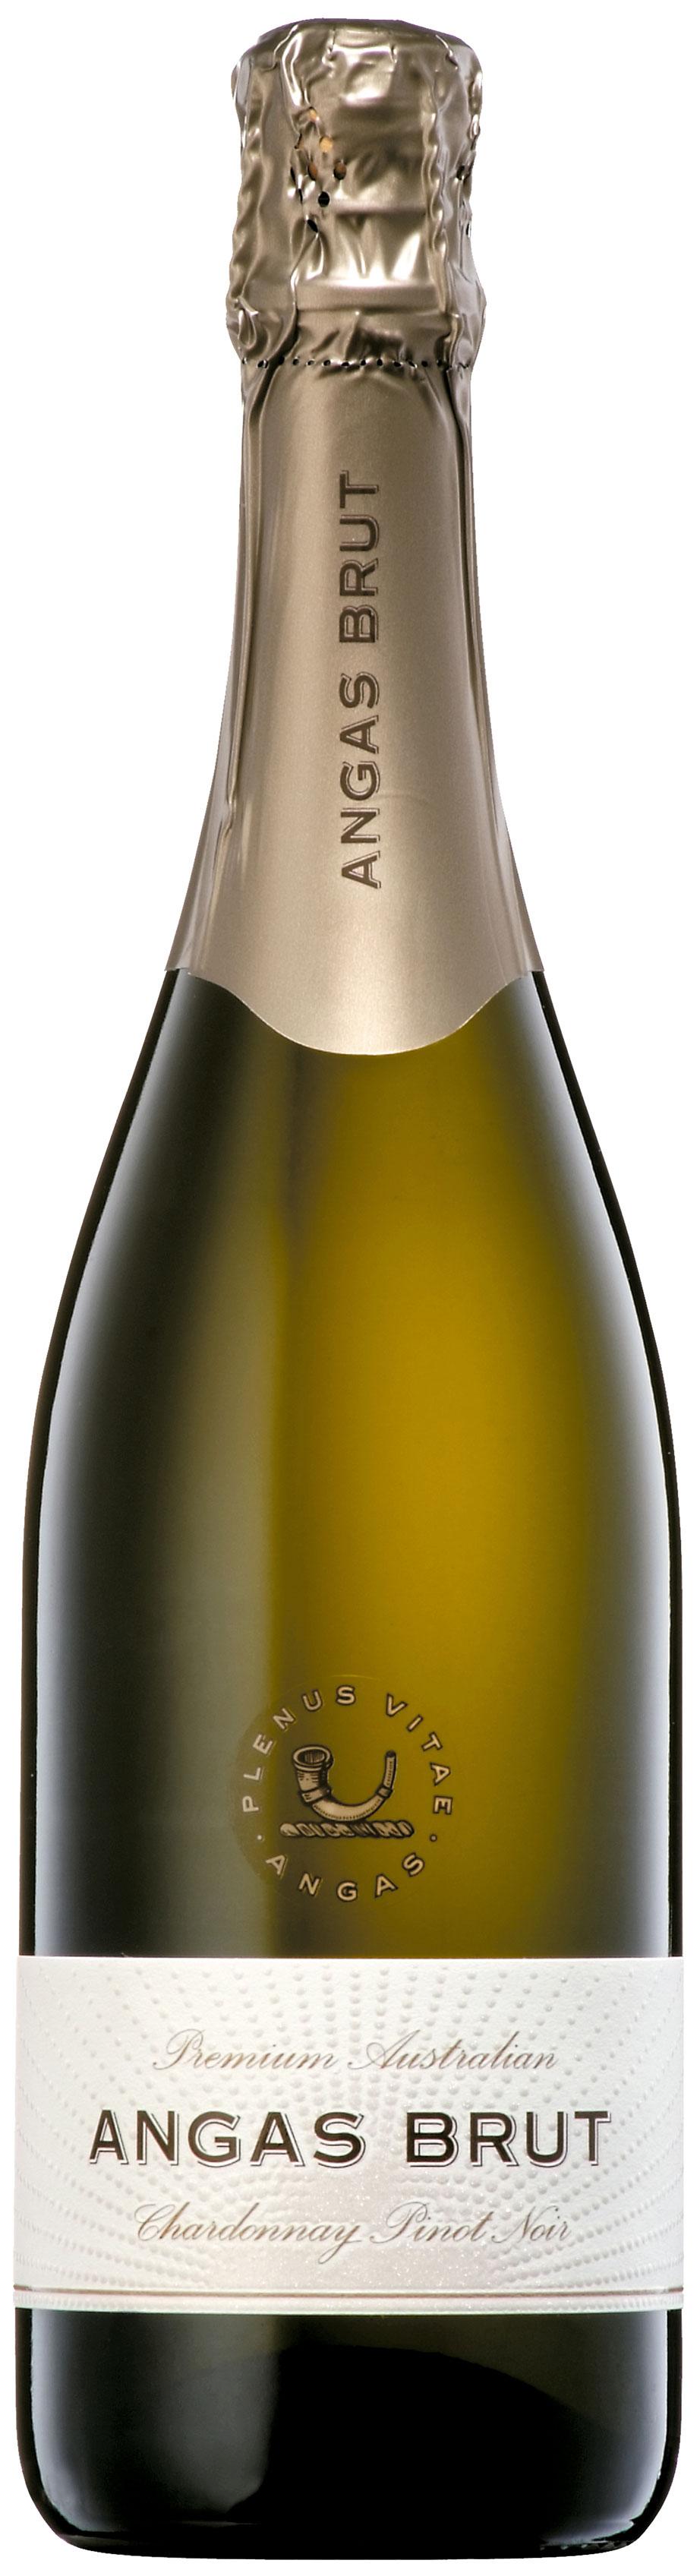 https://vinocorpperu.com/images/vinos/angas/angas_brut_premium_cuvee_nv.jpg